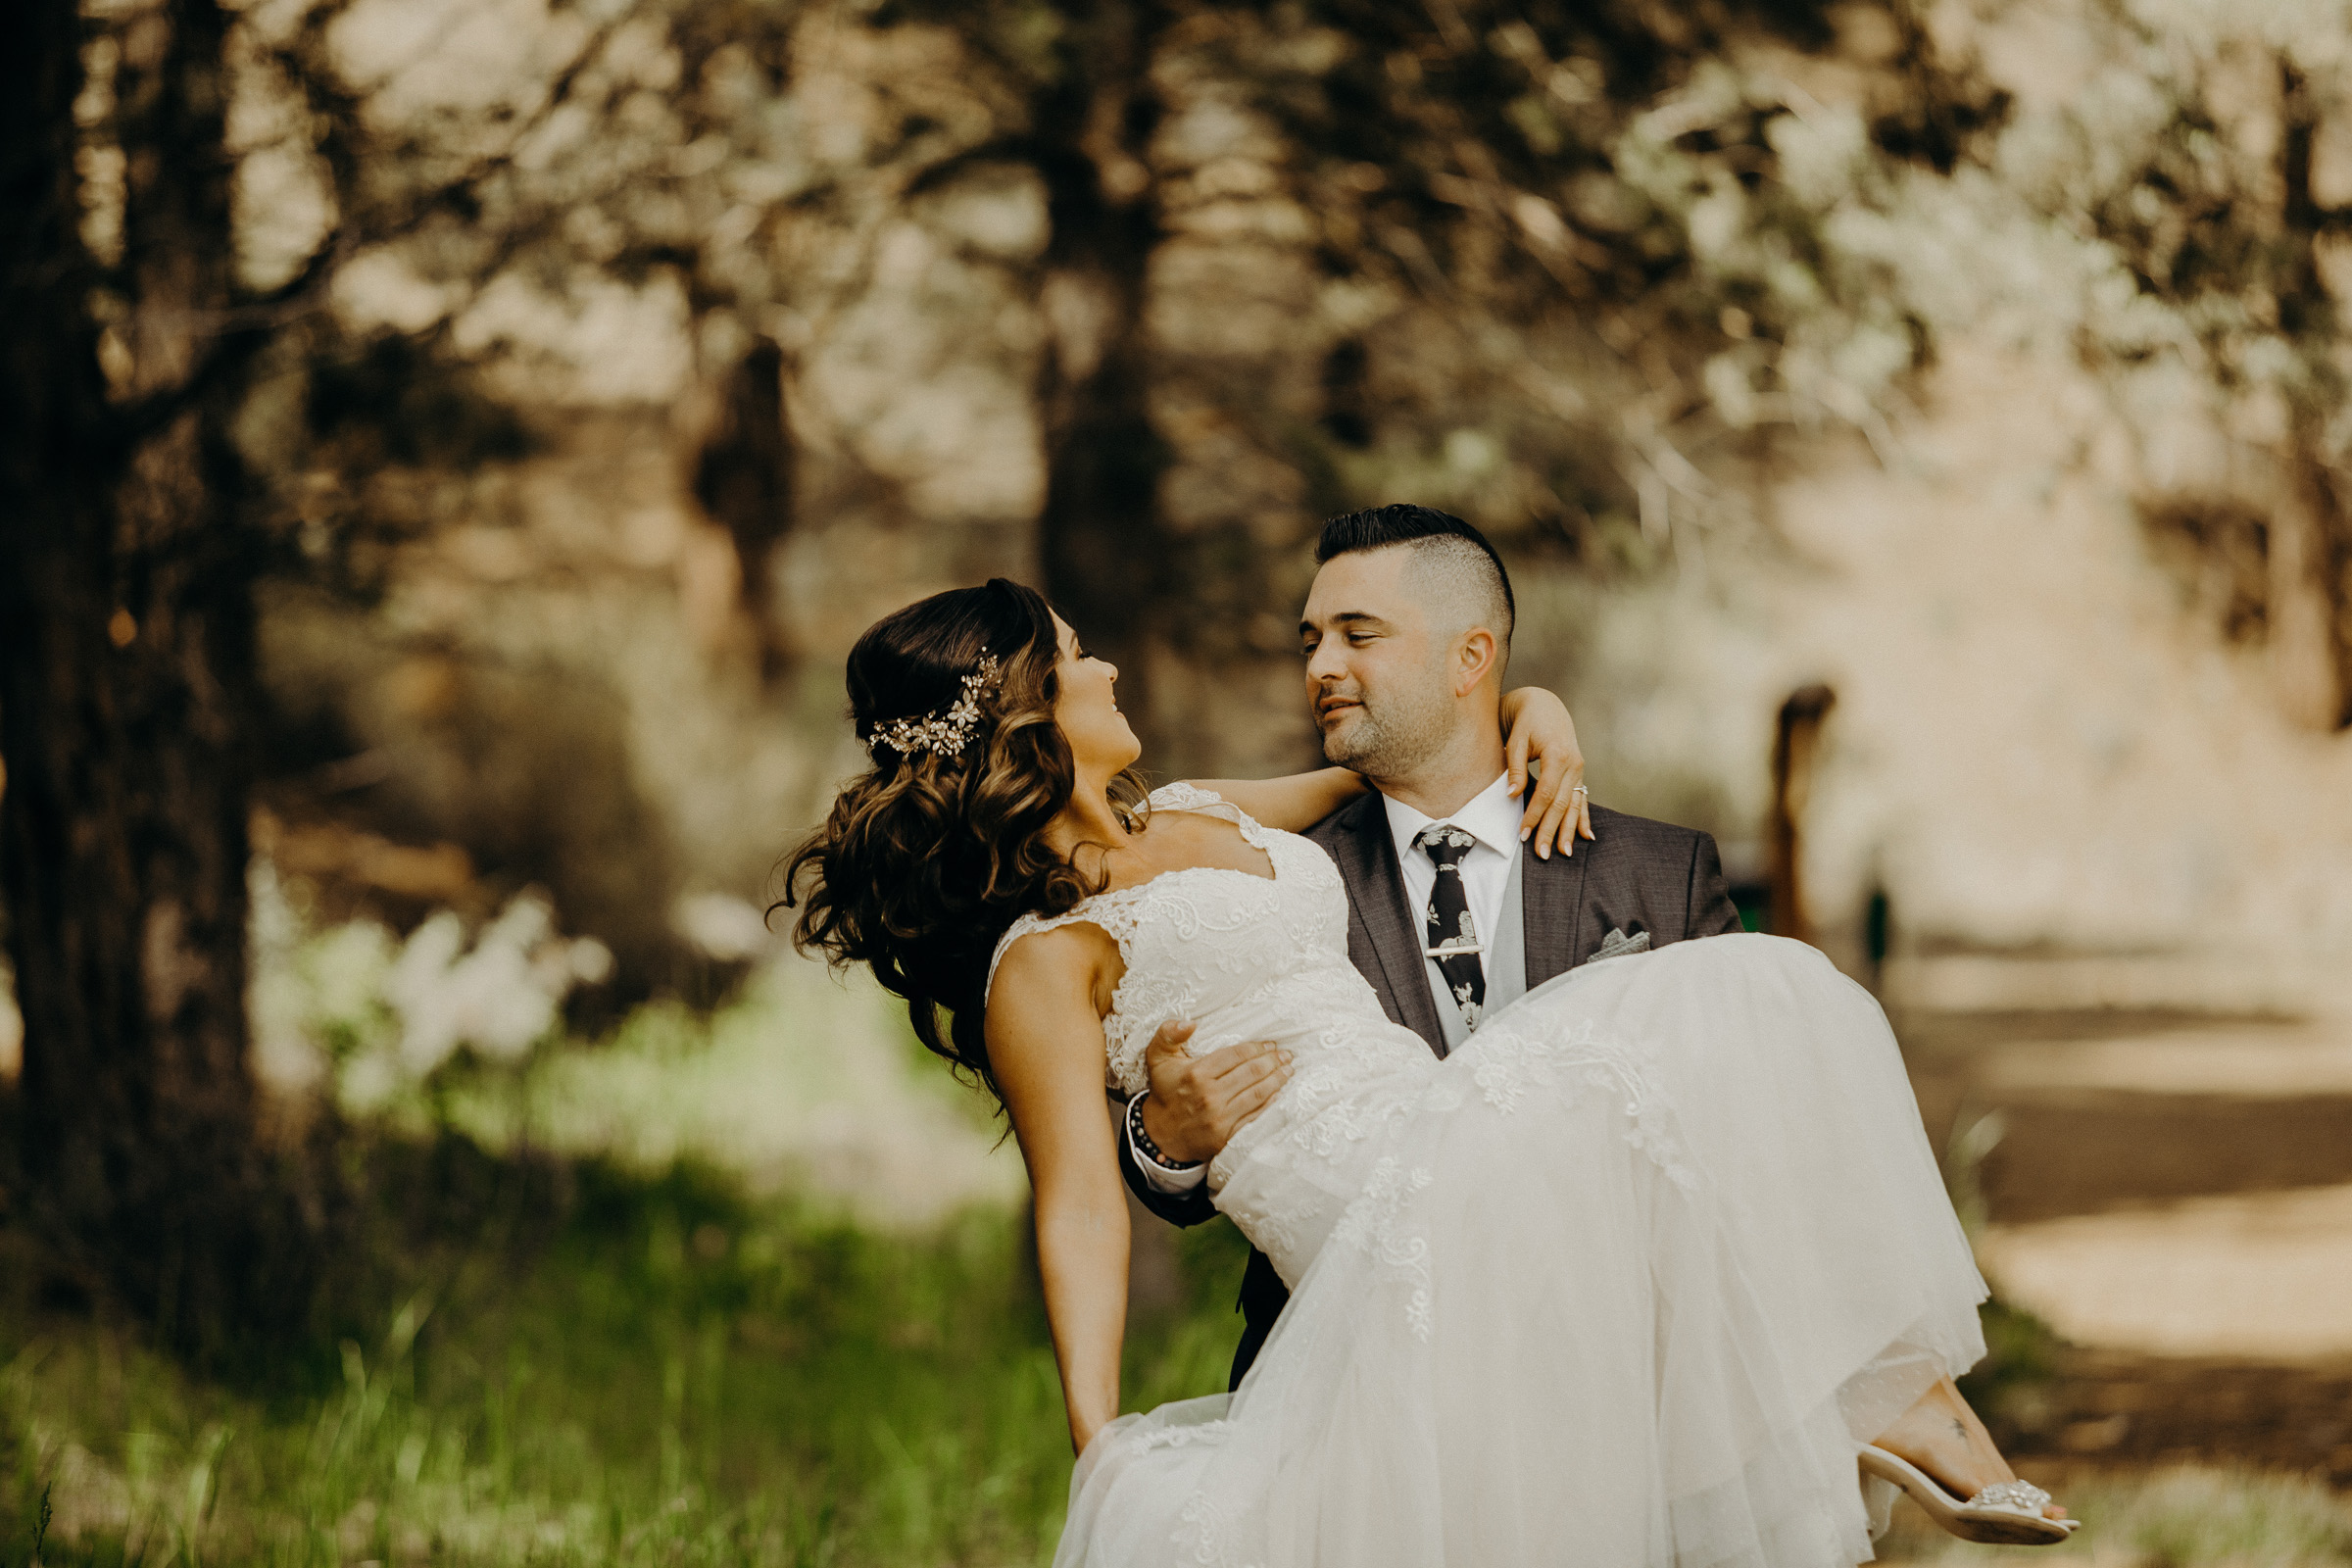 Brock + Caitlin Bend, Oregon Wedding 8.jpg